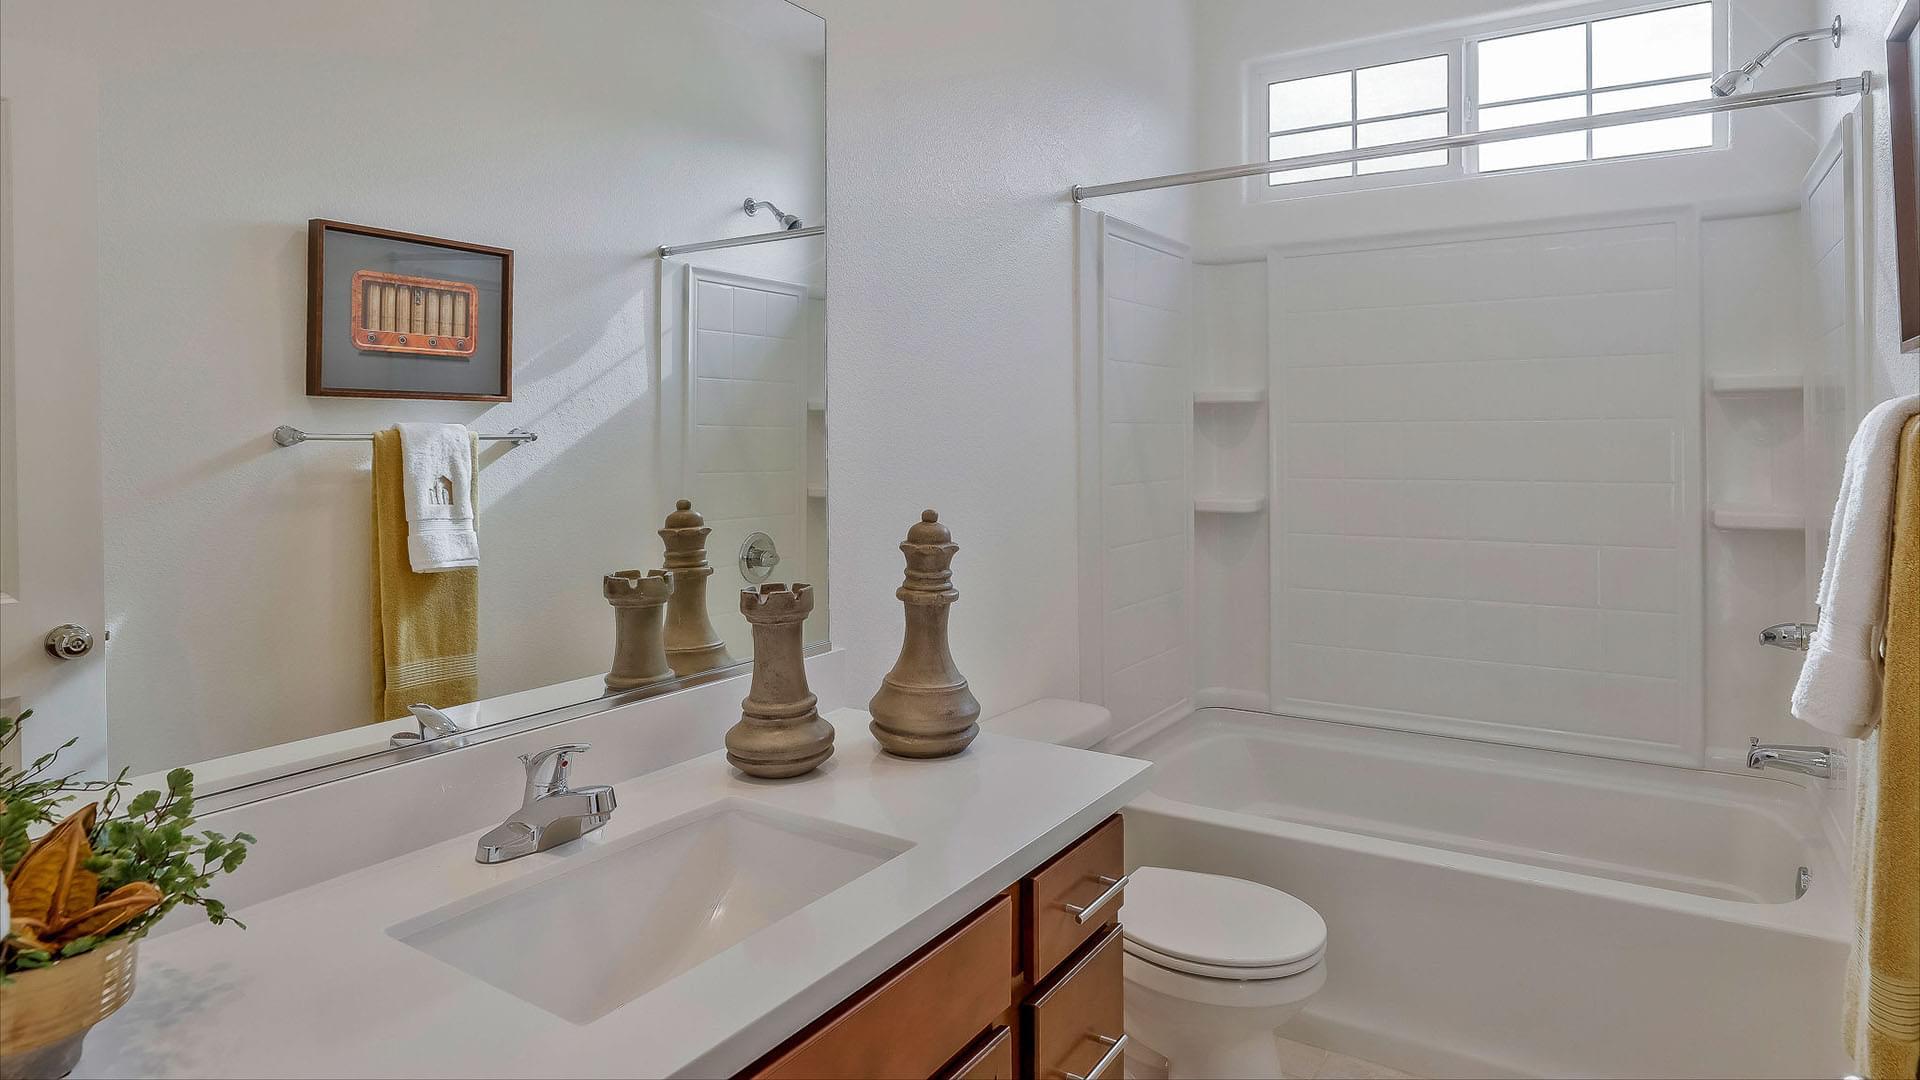 Residence 2 Bath 2